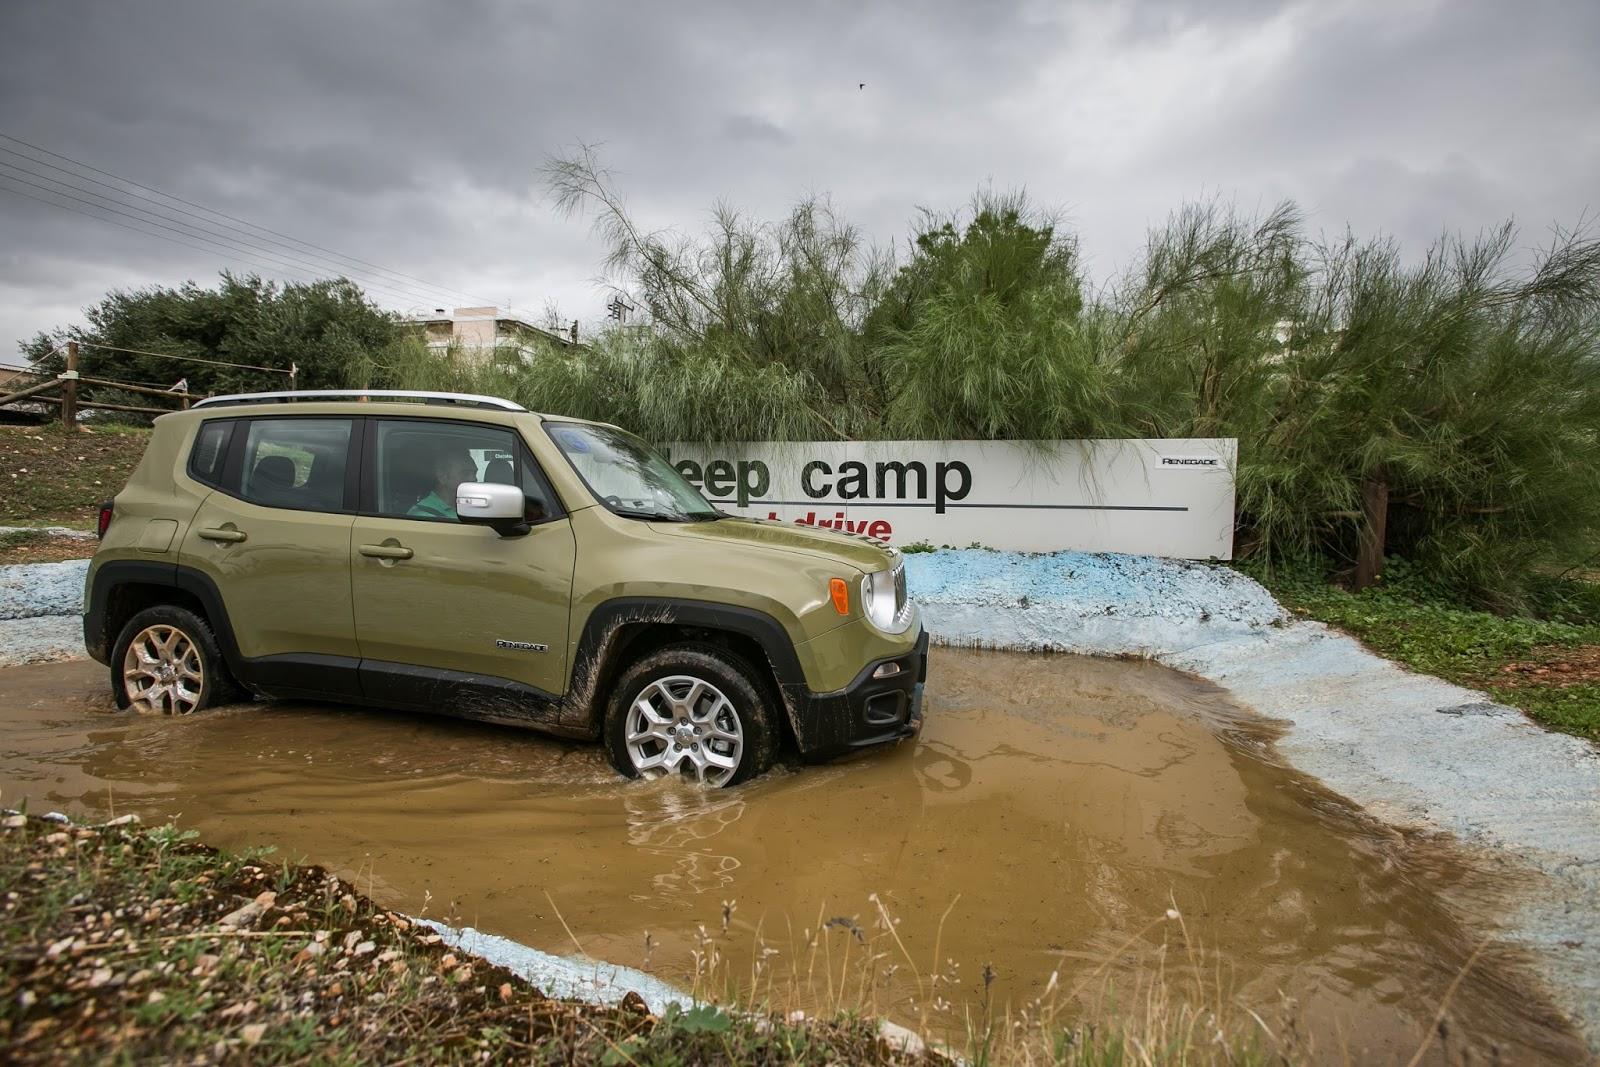 GK 0447 Πετάμε ένα Jeep Renegade σε λάσπες, πέτρες, άμμο, λίμνες. Θα τα καταφέρει; Jeep, Jeep Renegade, Renegade, SUV, TEST, zblog, ΔΟΚΙΜΕΣ